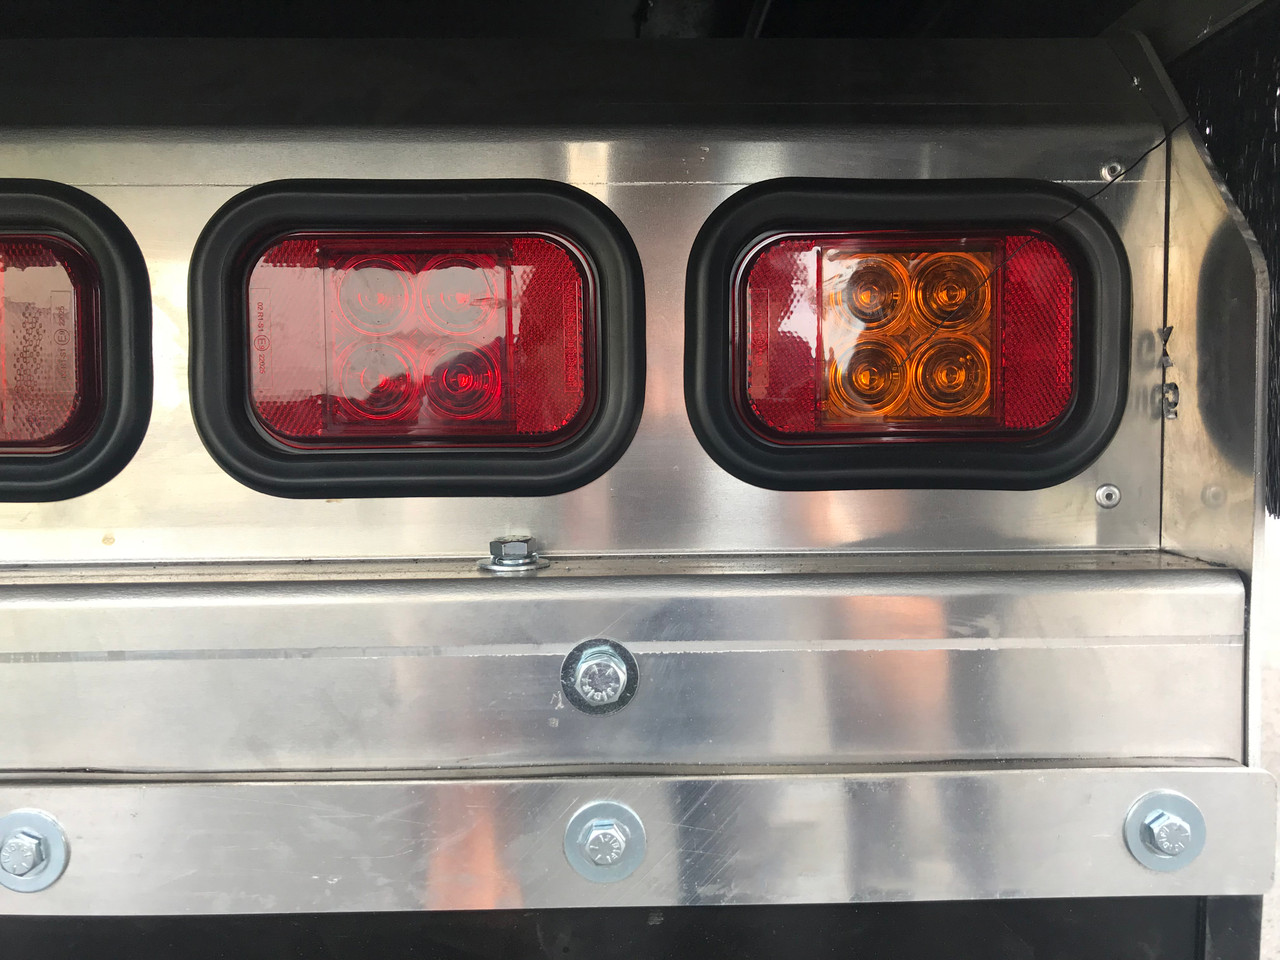 133AMG - Indicator Light with Reflector Rectangle. Multi-Volt 12v & 24v Blister Single Pack. LED Auto Lamps. Ultimate LED.